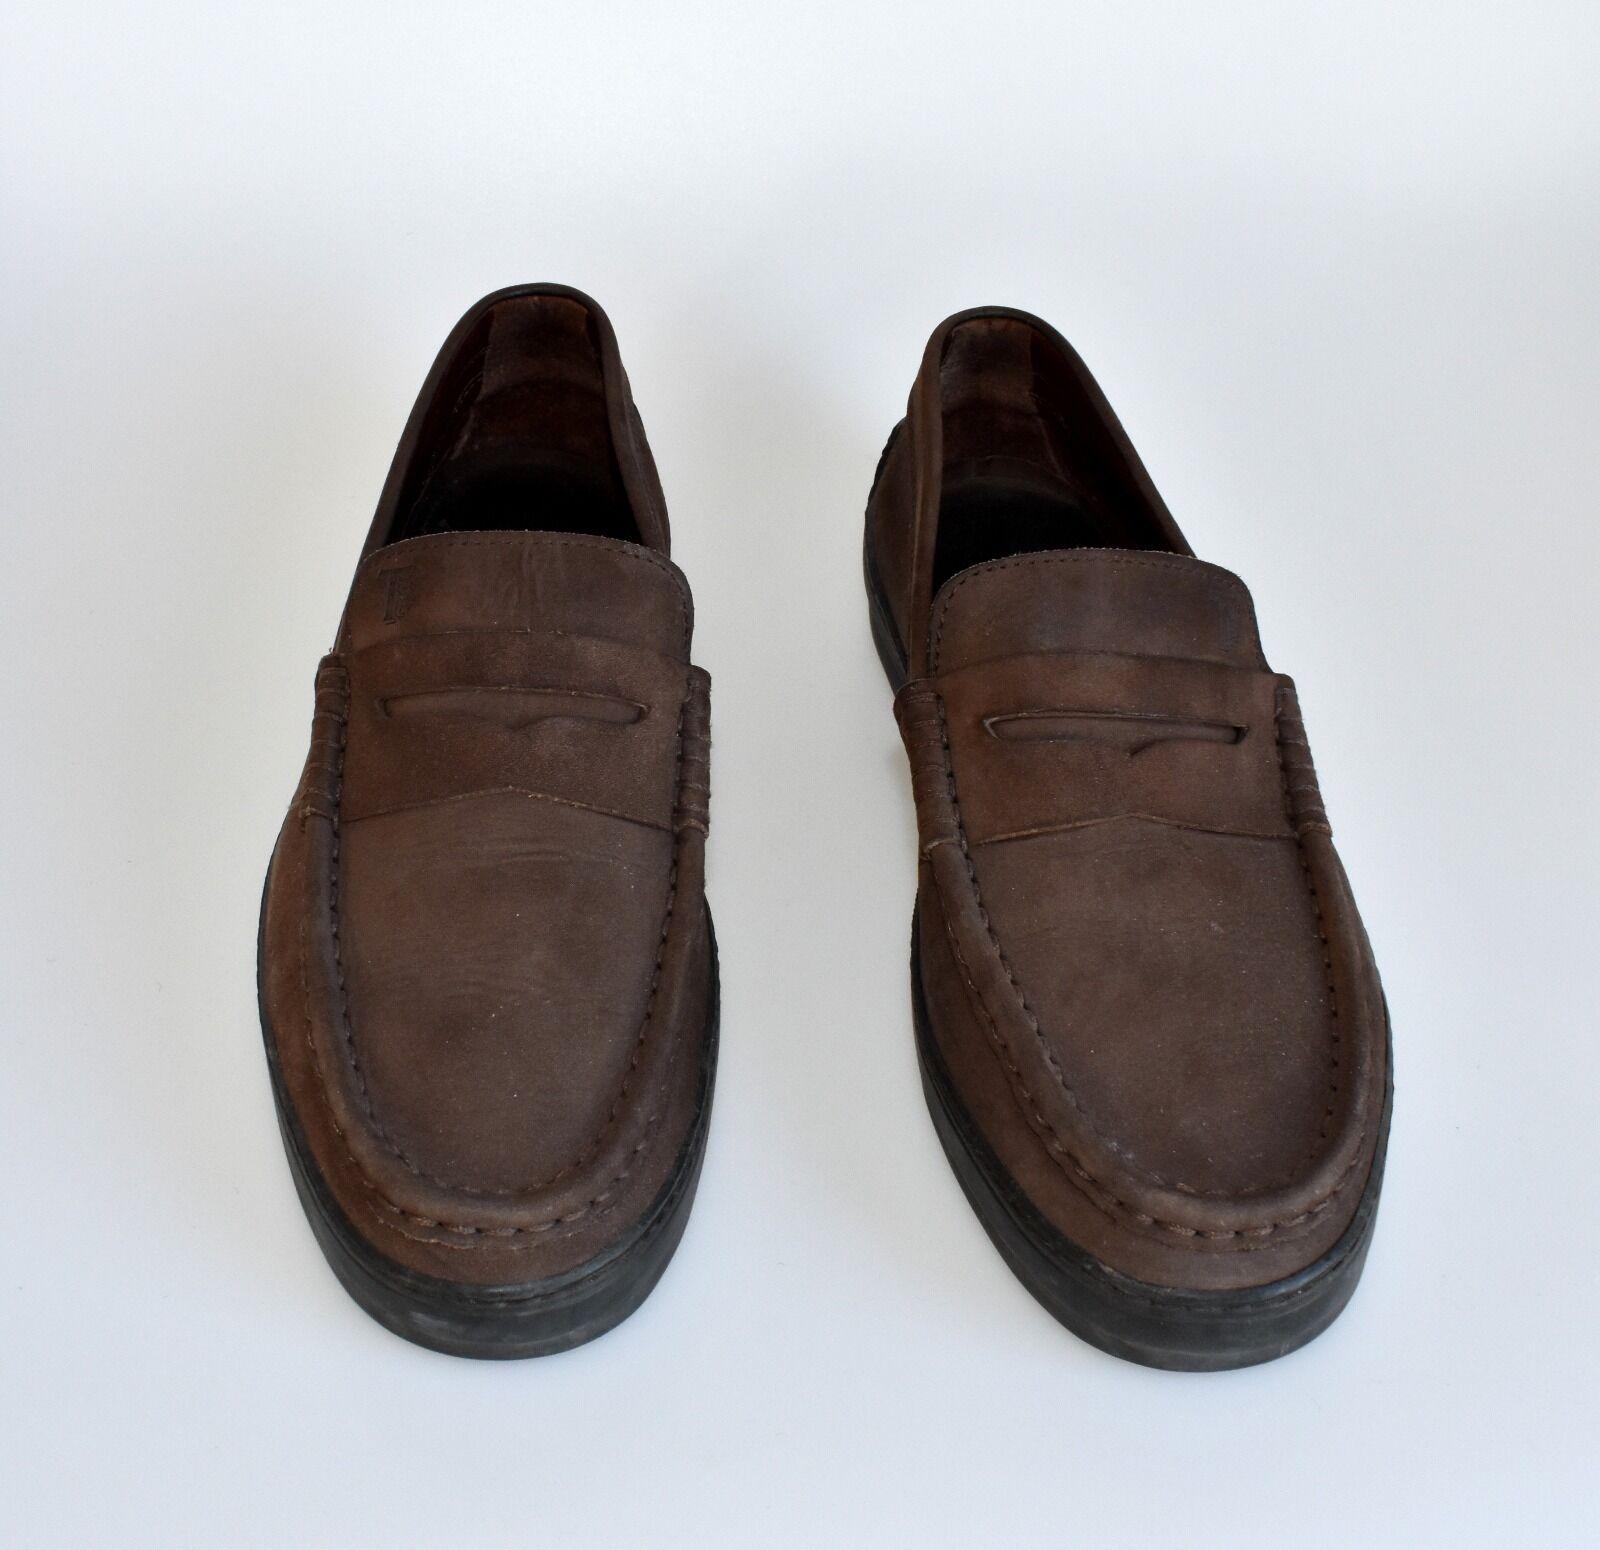 TODS Uomo shoes SZ 44 - - - 45 11 US color brown suede thicks Vibram sole Bra 223a15